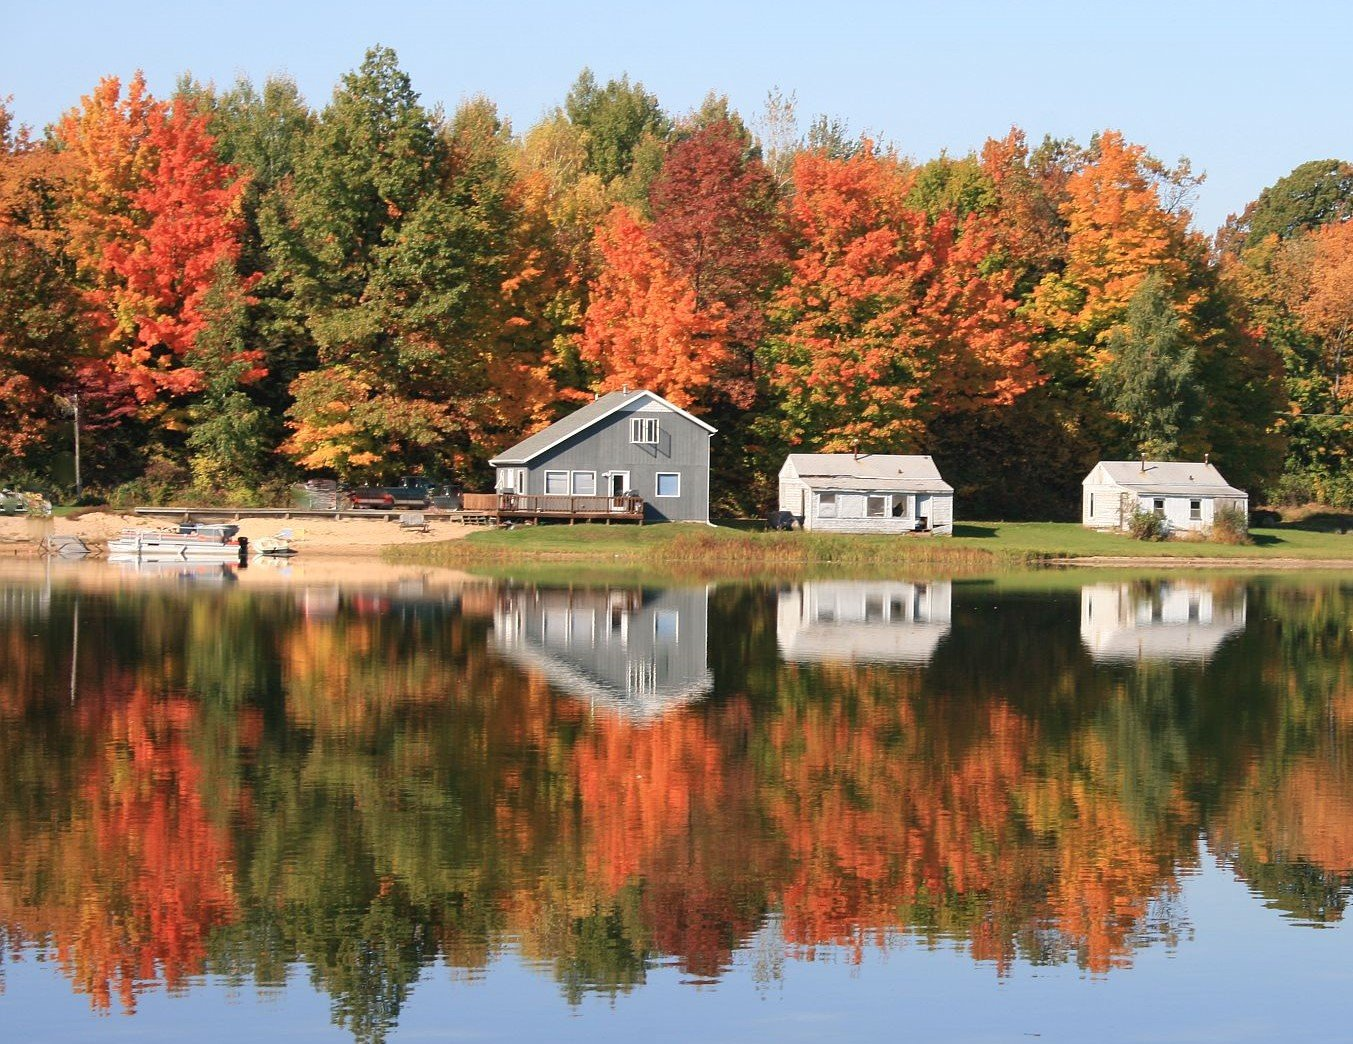 Loving the fall season